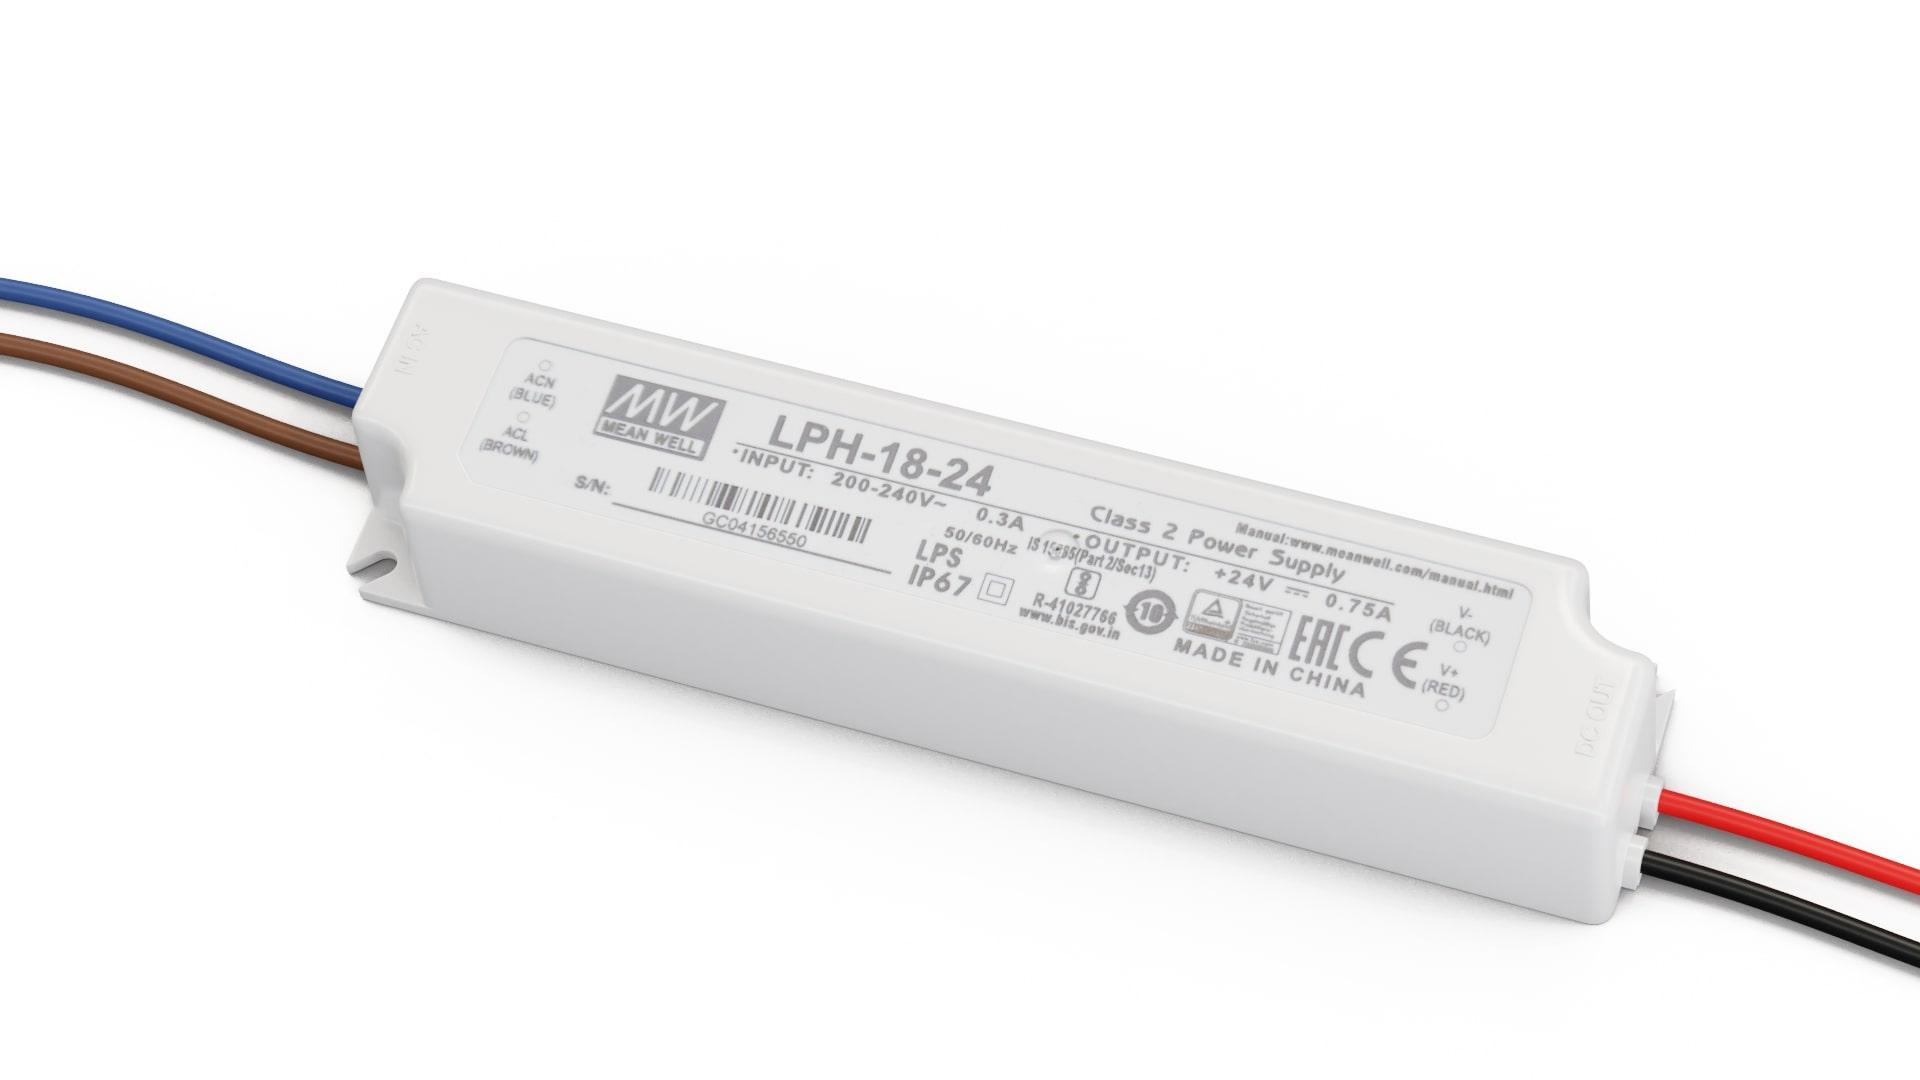 Zasilacz MEAN WELL LPH 24V 18W IP67